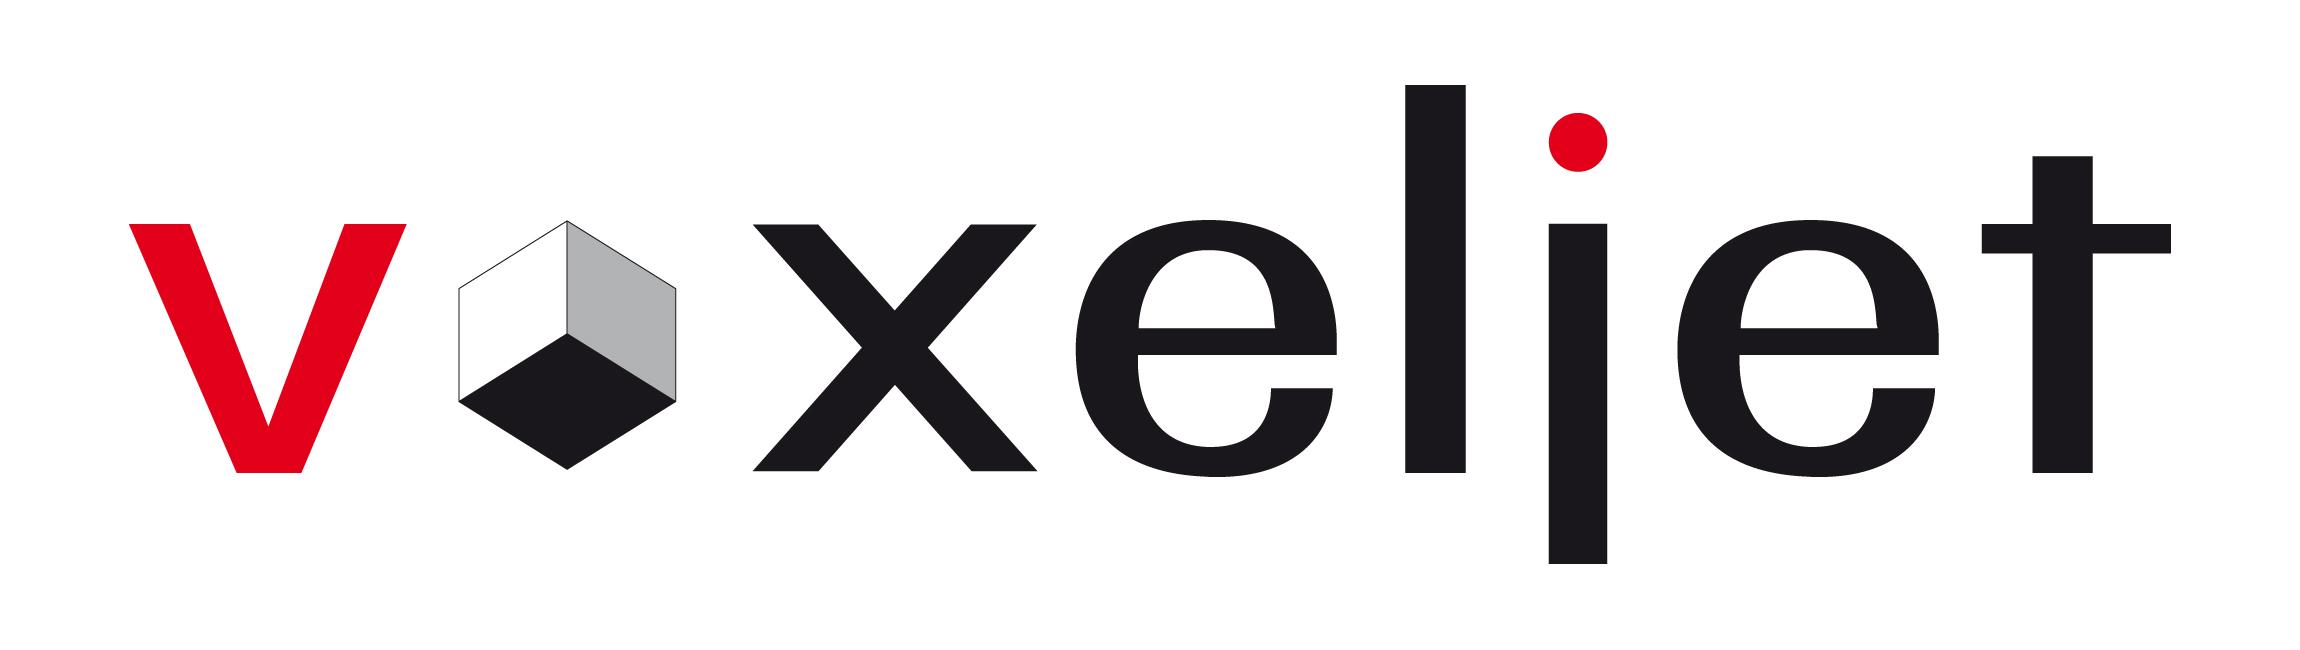 voxljet_ohne_logo_4c